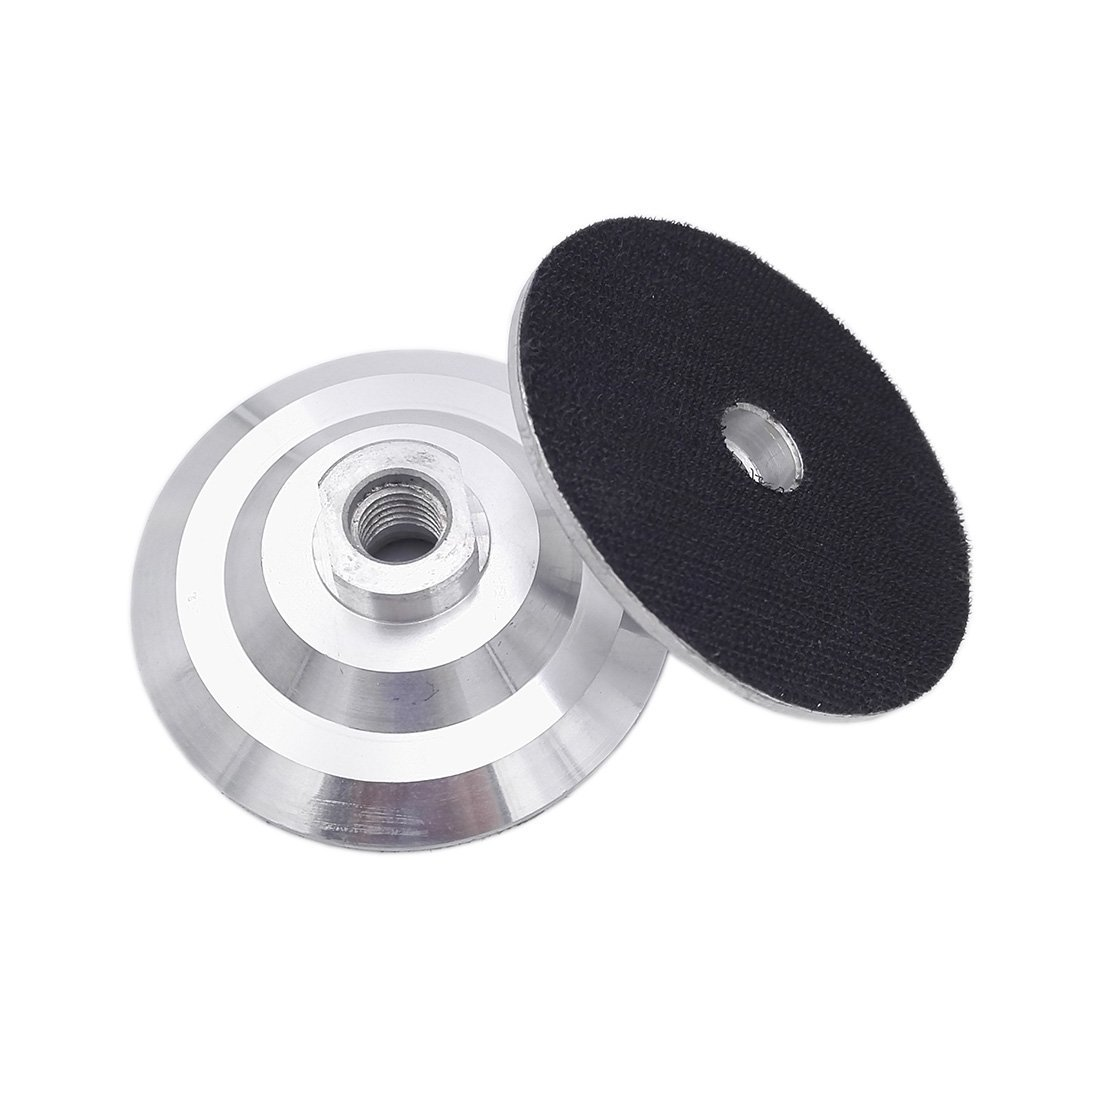 DIATOOL 2pcs 4 INCH Aluminum based backer Back pad for diamond polishing pads 5/8-11 Thread Velcro backing pad with flexible Nylon Buckle backup pad Hook&Loop Backing Pad Hard Backing Pad